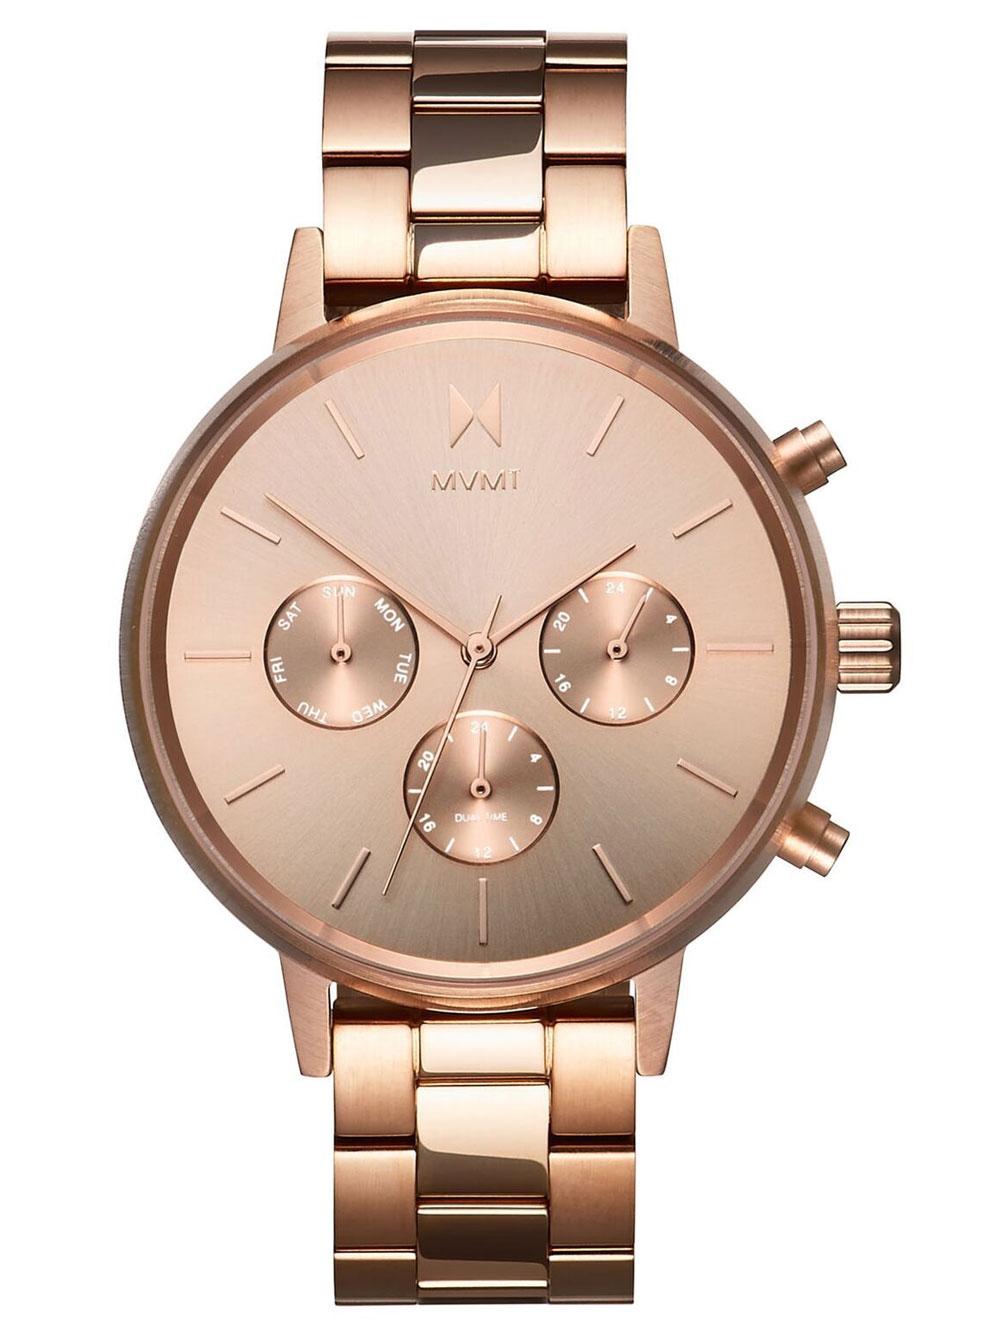 Uhren - MVMT FC01 RG Nova Leo Damen 38mm 5ATM  - Onlineshop Timeshop24